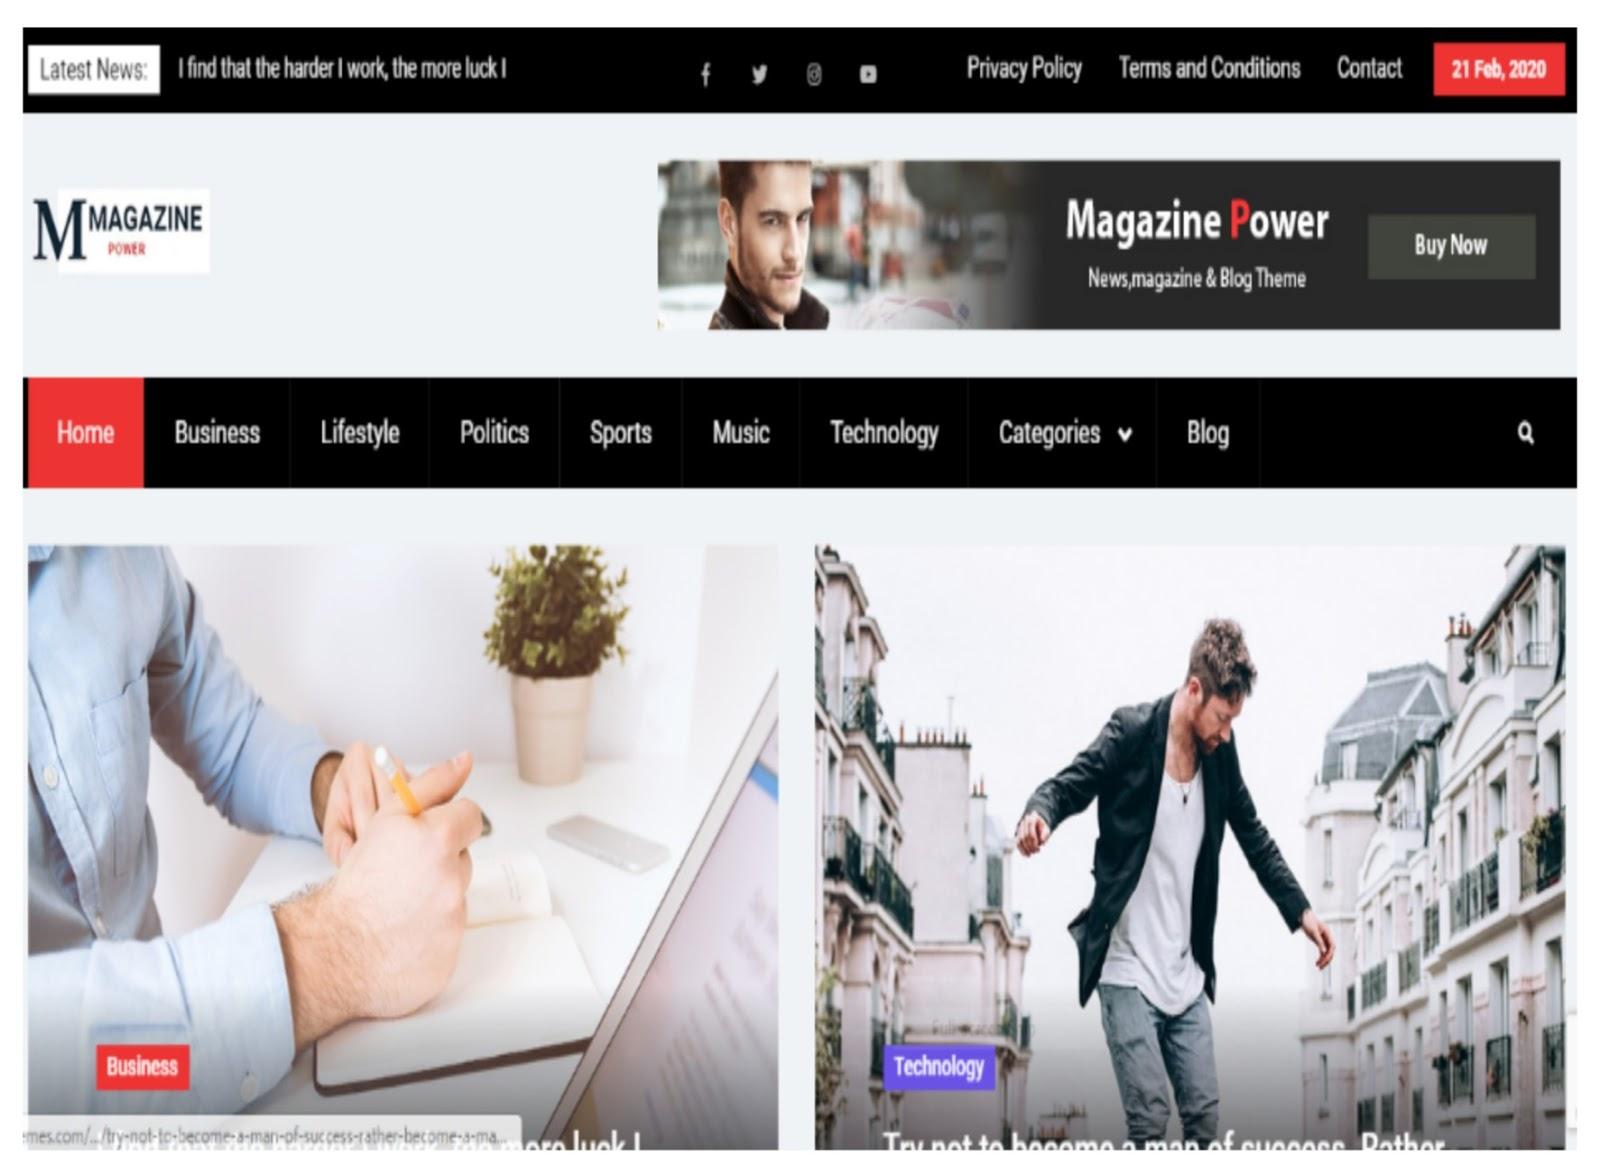 Magazine Power WordPress Theme